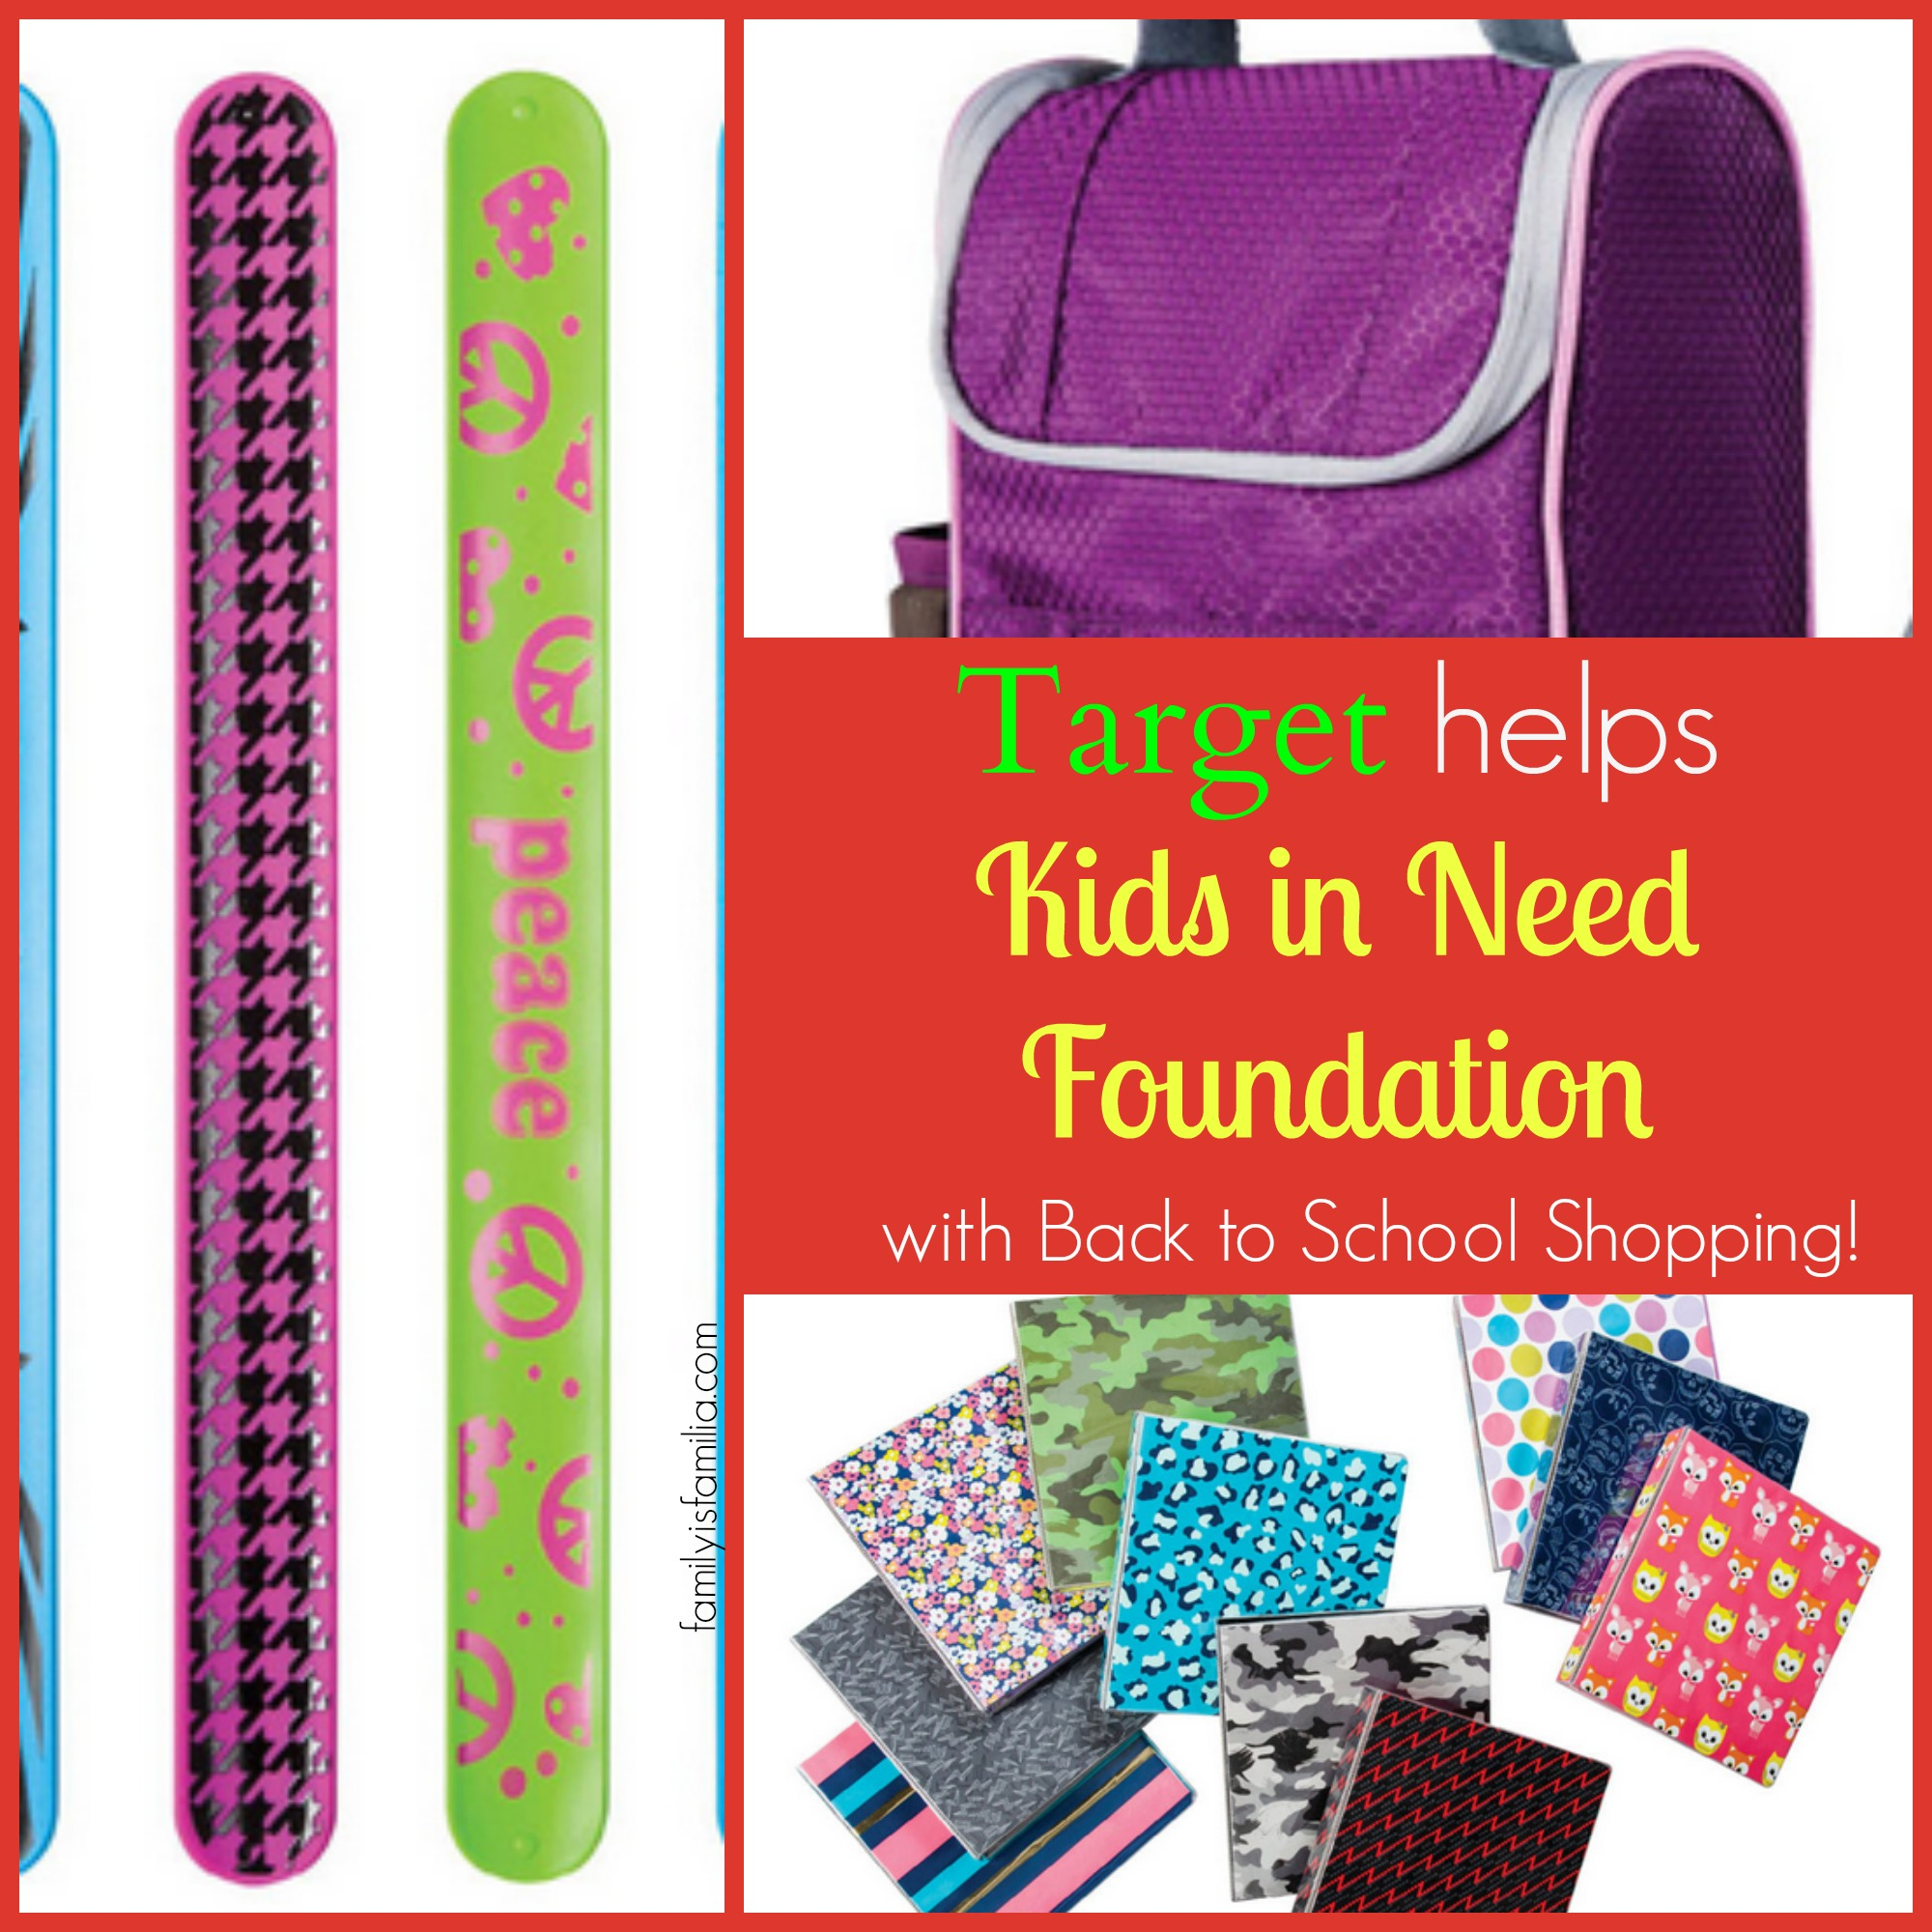 target-helps-kids-need-foundation